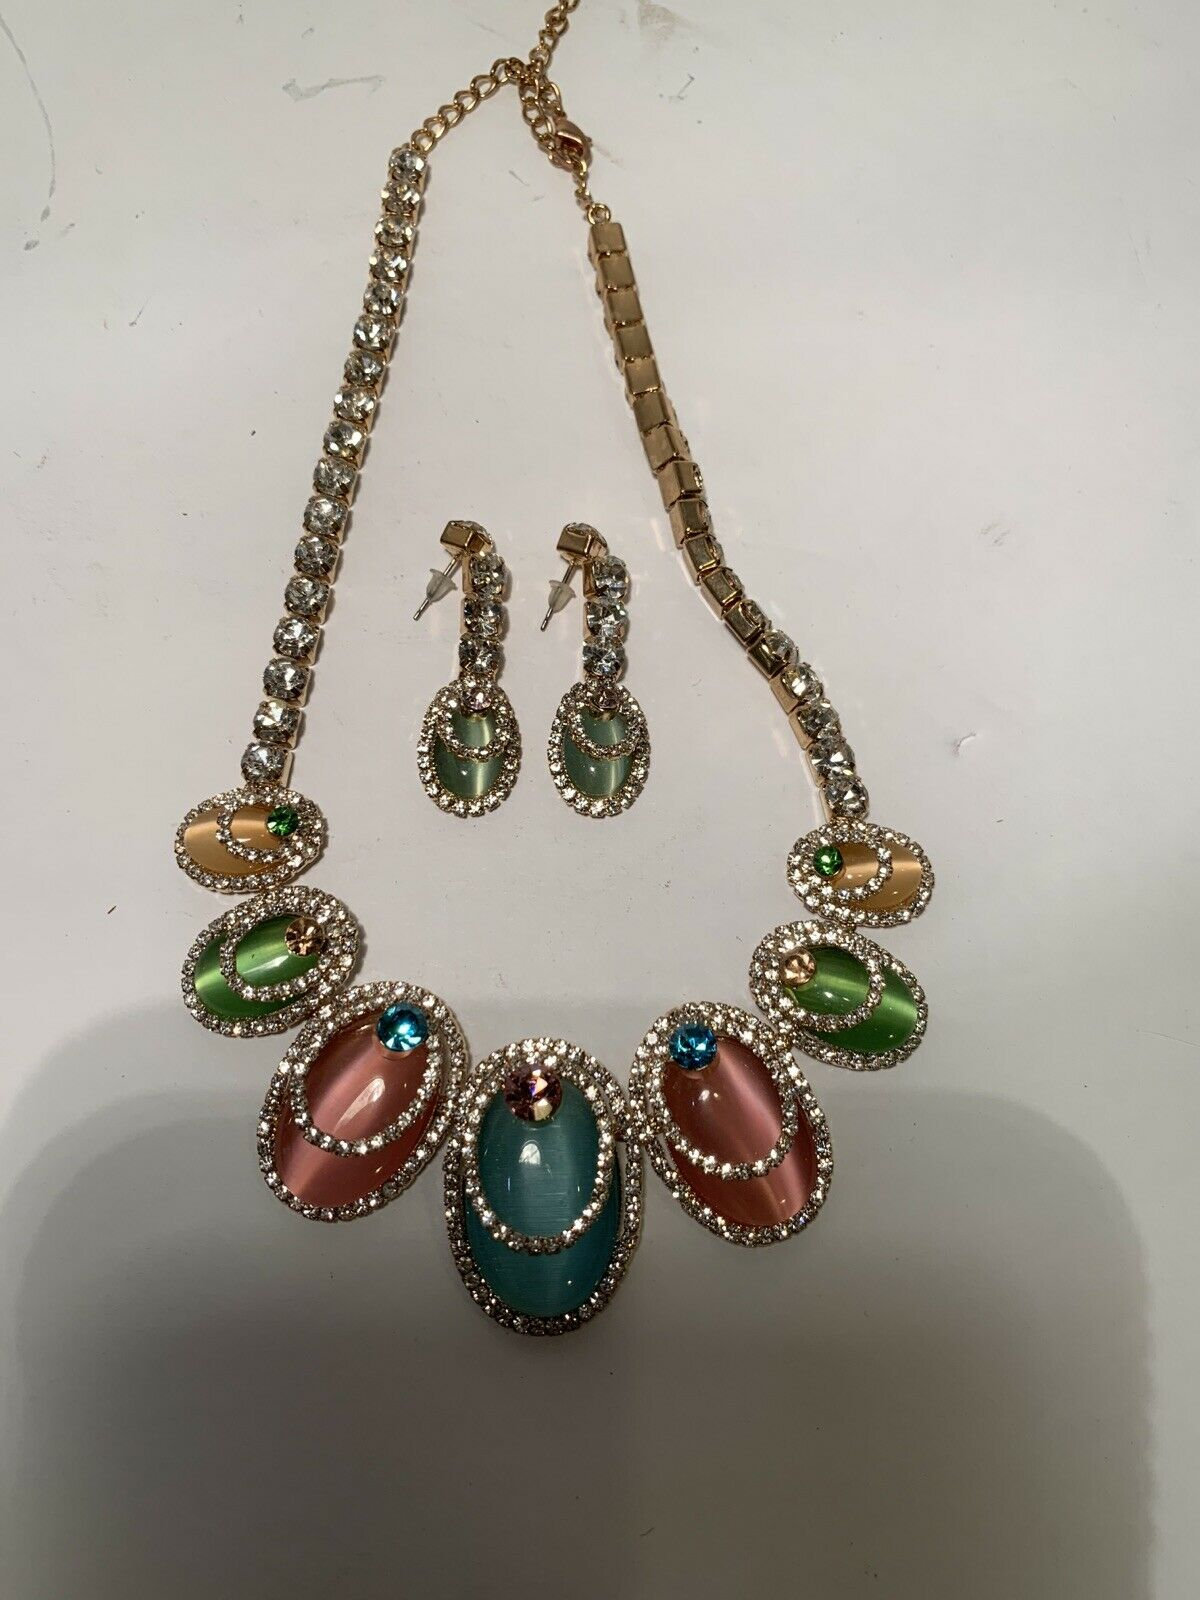 Wonderful Antique Bib Necklace Enamel and Multicolor Glass